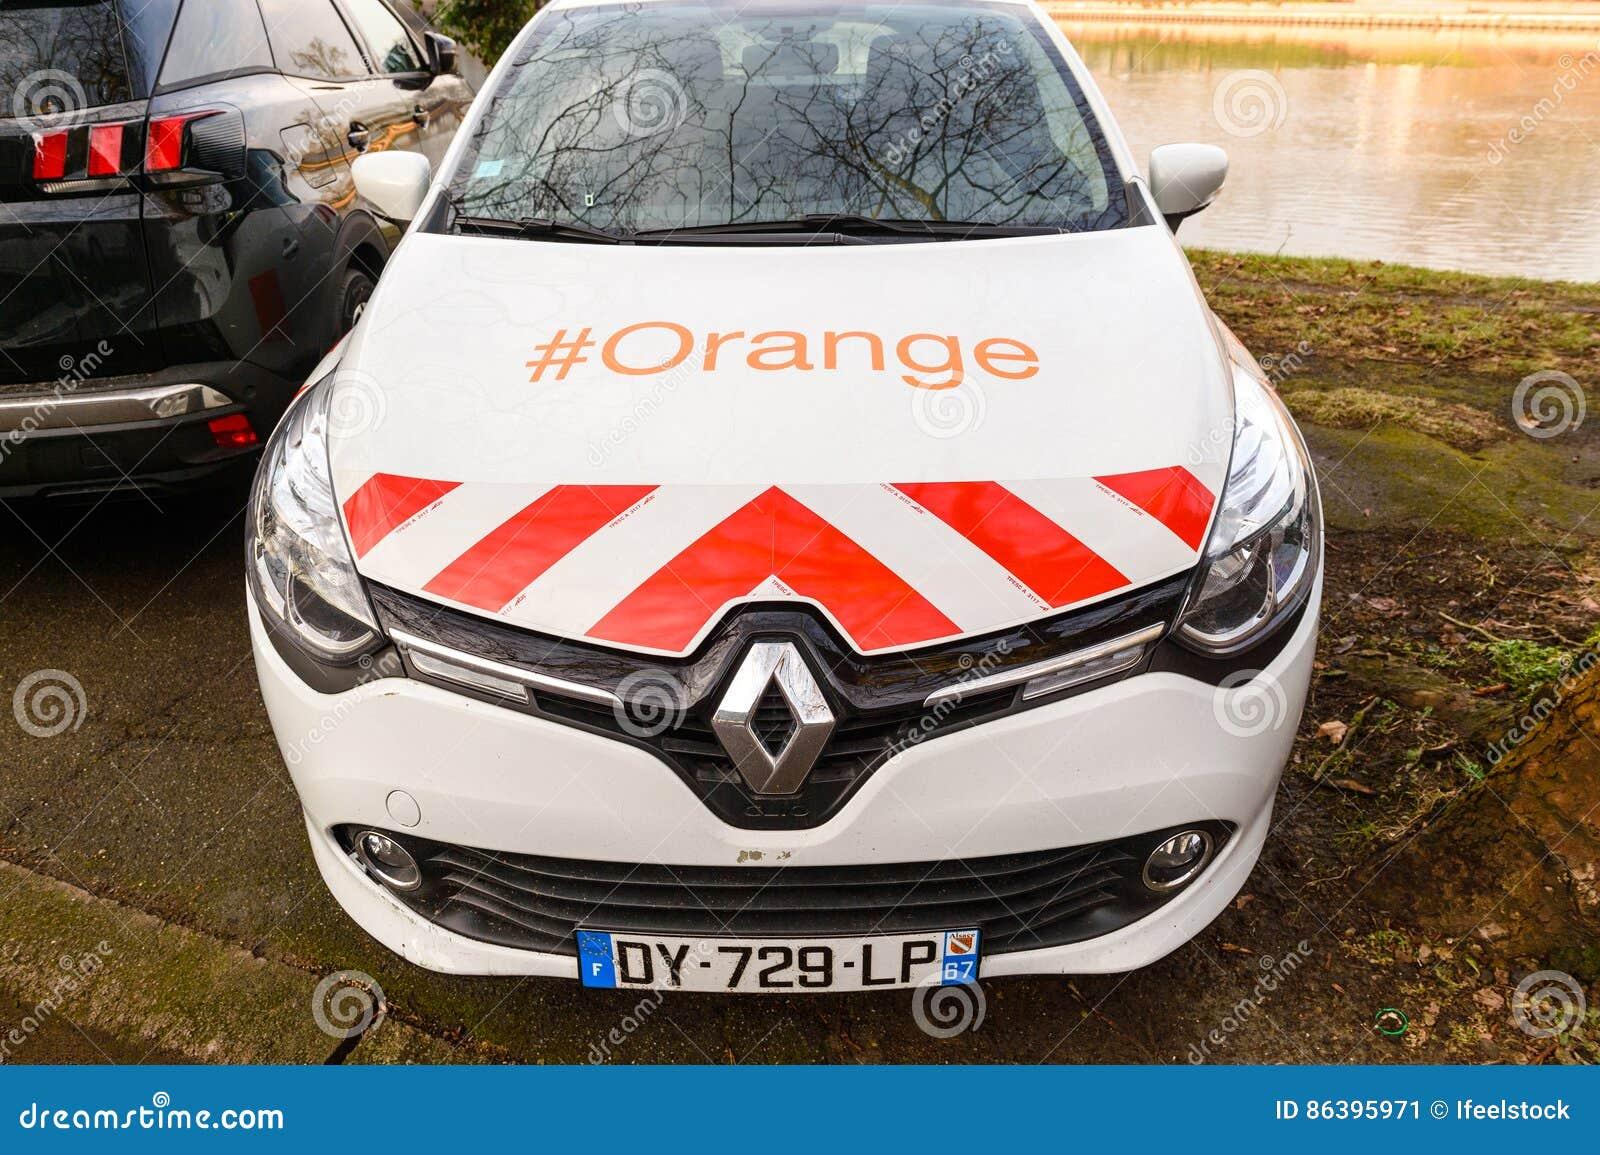 voiture orange renault de service de t l com photo ditorial image 86395971. Black Bedroom Furniture Sets. Home Design Ideas